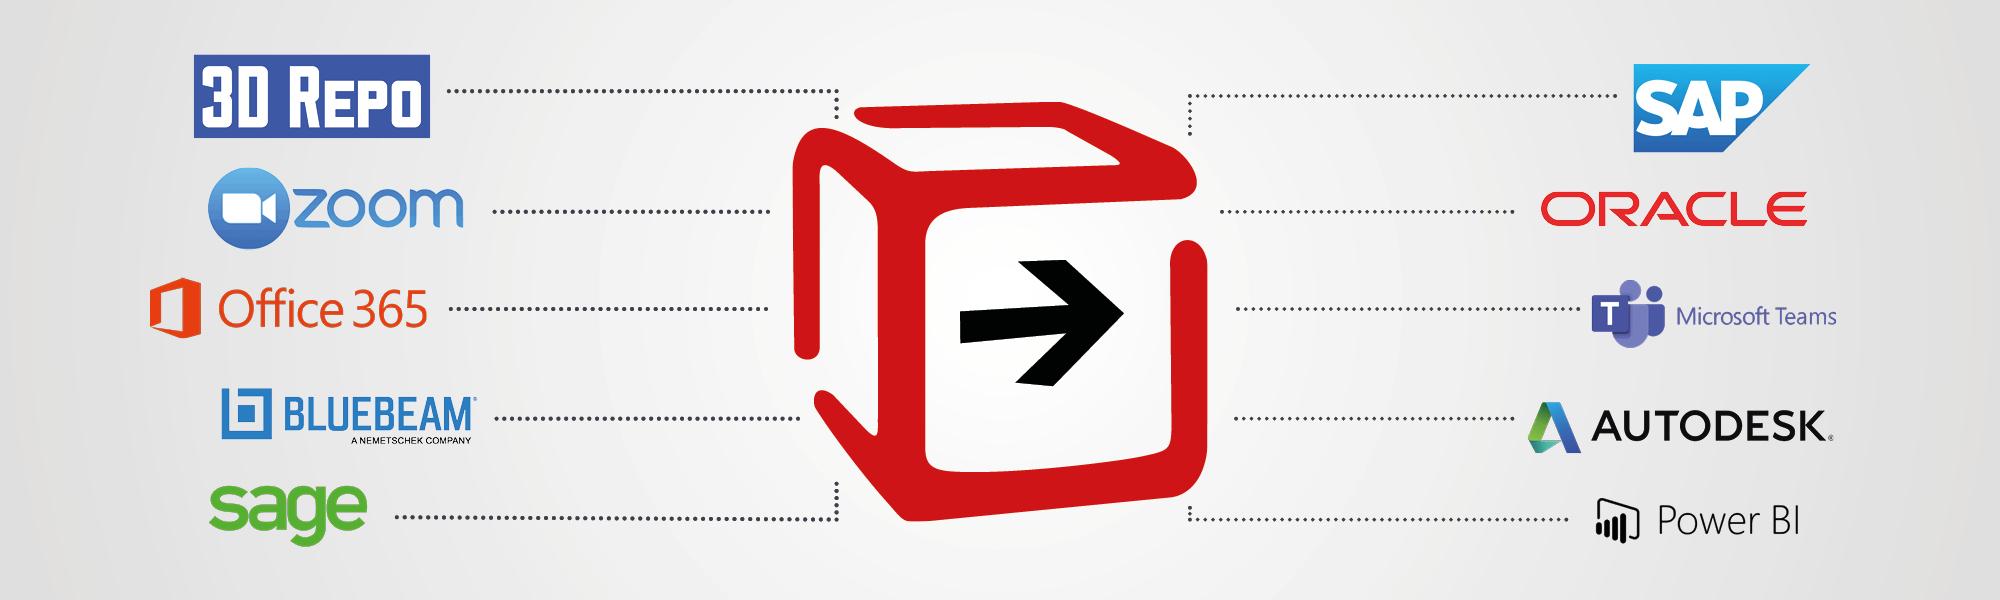 Asite_API_Oracle_Zoom_BlueBeam_PowerBI